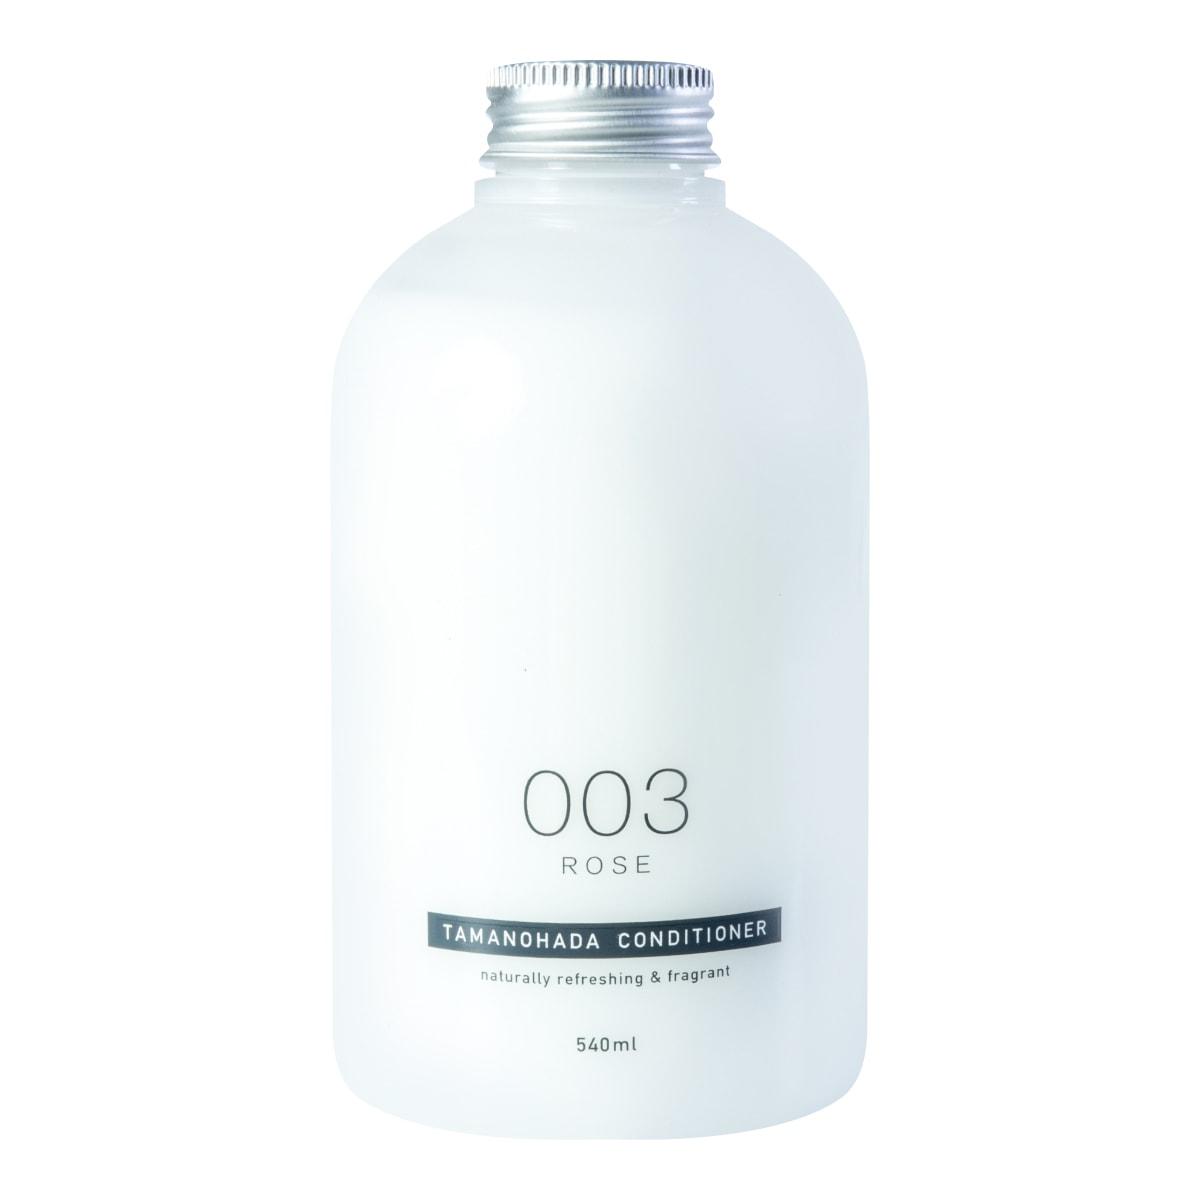 日本TAMANOHADA玉肌 无硅油护发素 #003玫瑰香 540ml